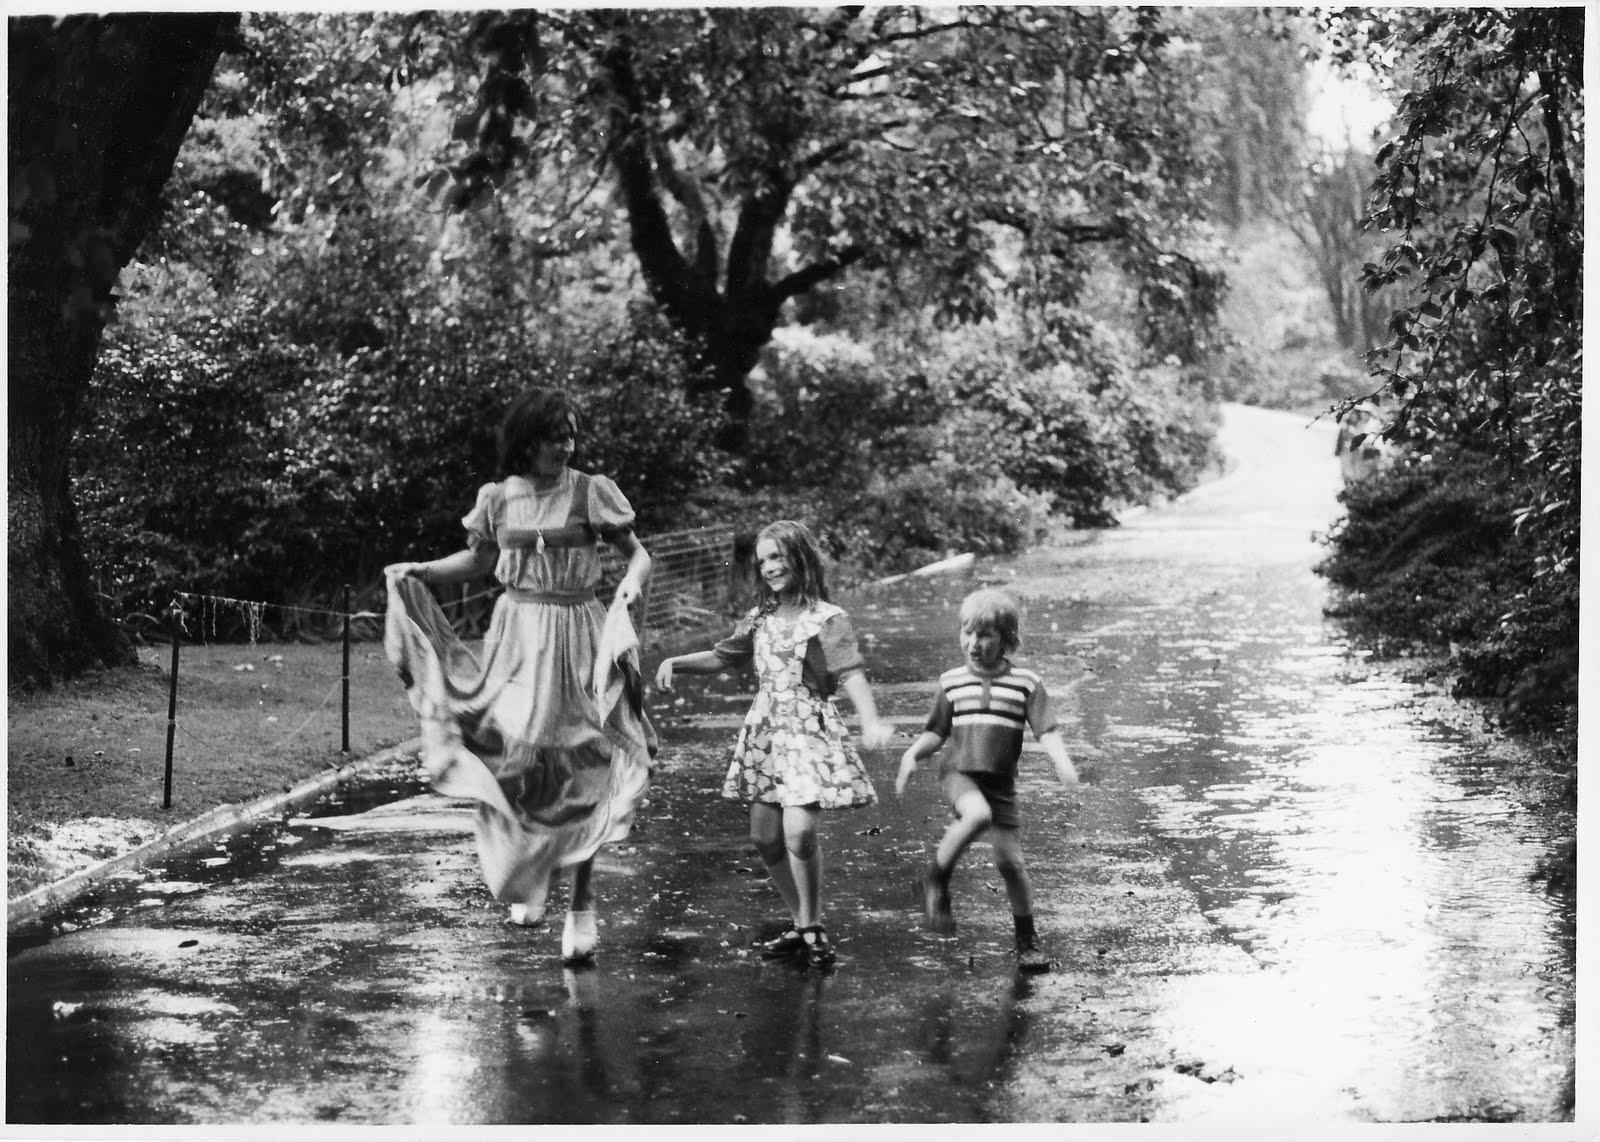 Kids Dancing In The Rain Dancing in the rain in theKids Dancing In The Rain Photography